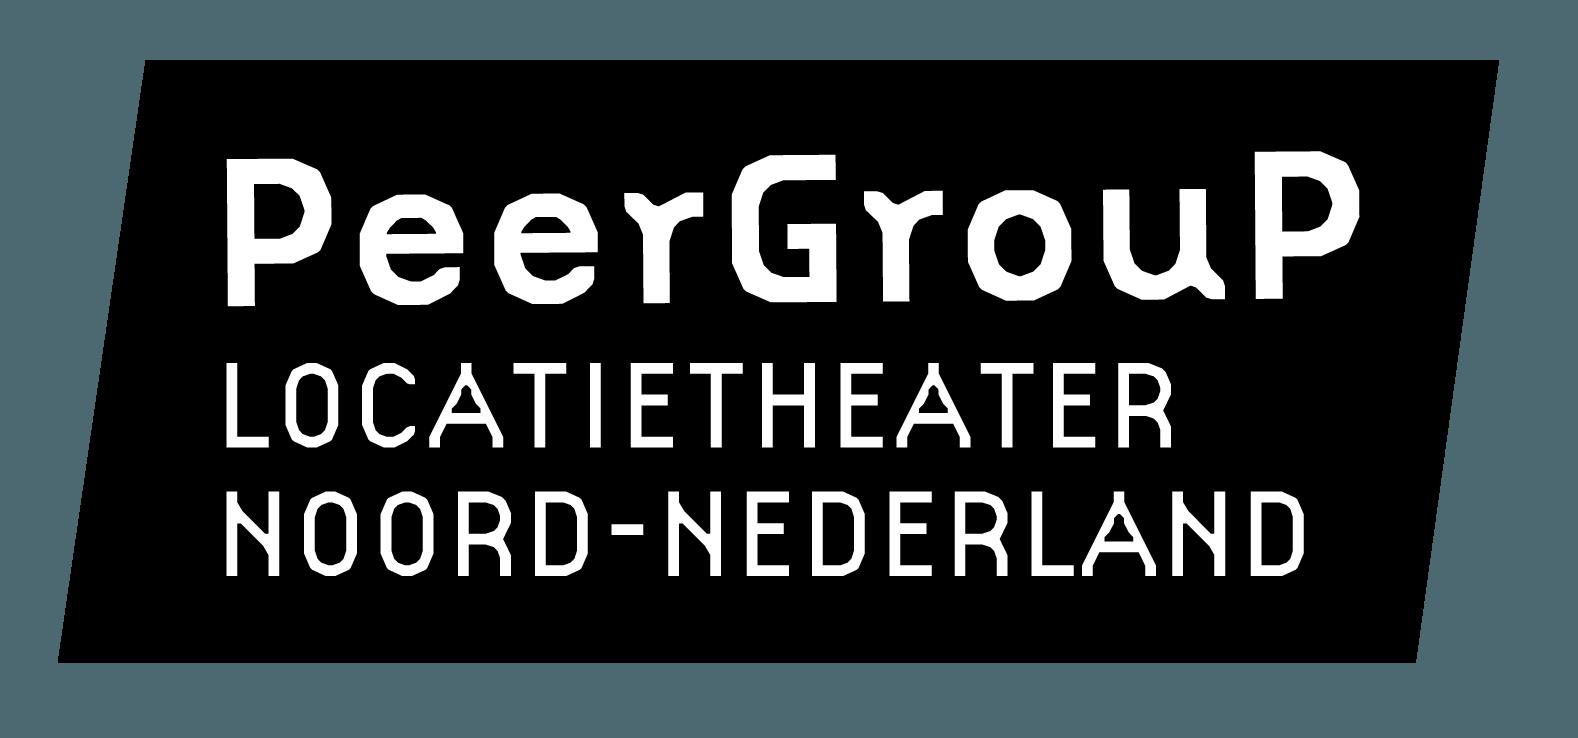 PeerGrouP Locatietheater Noord-Nederland